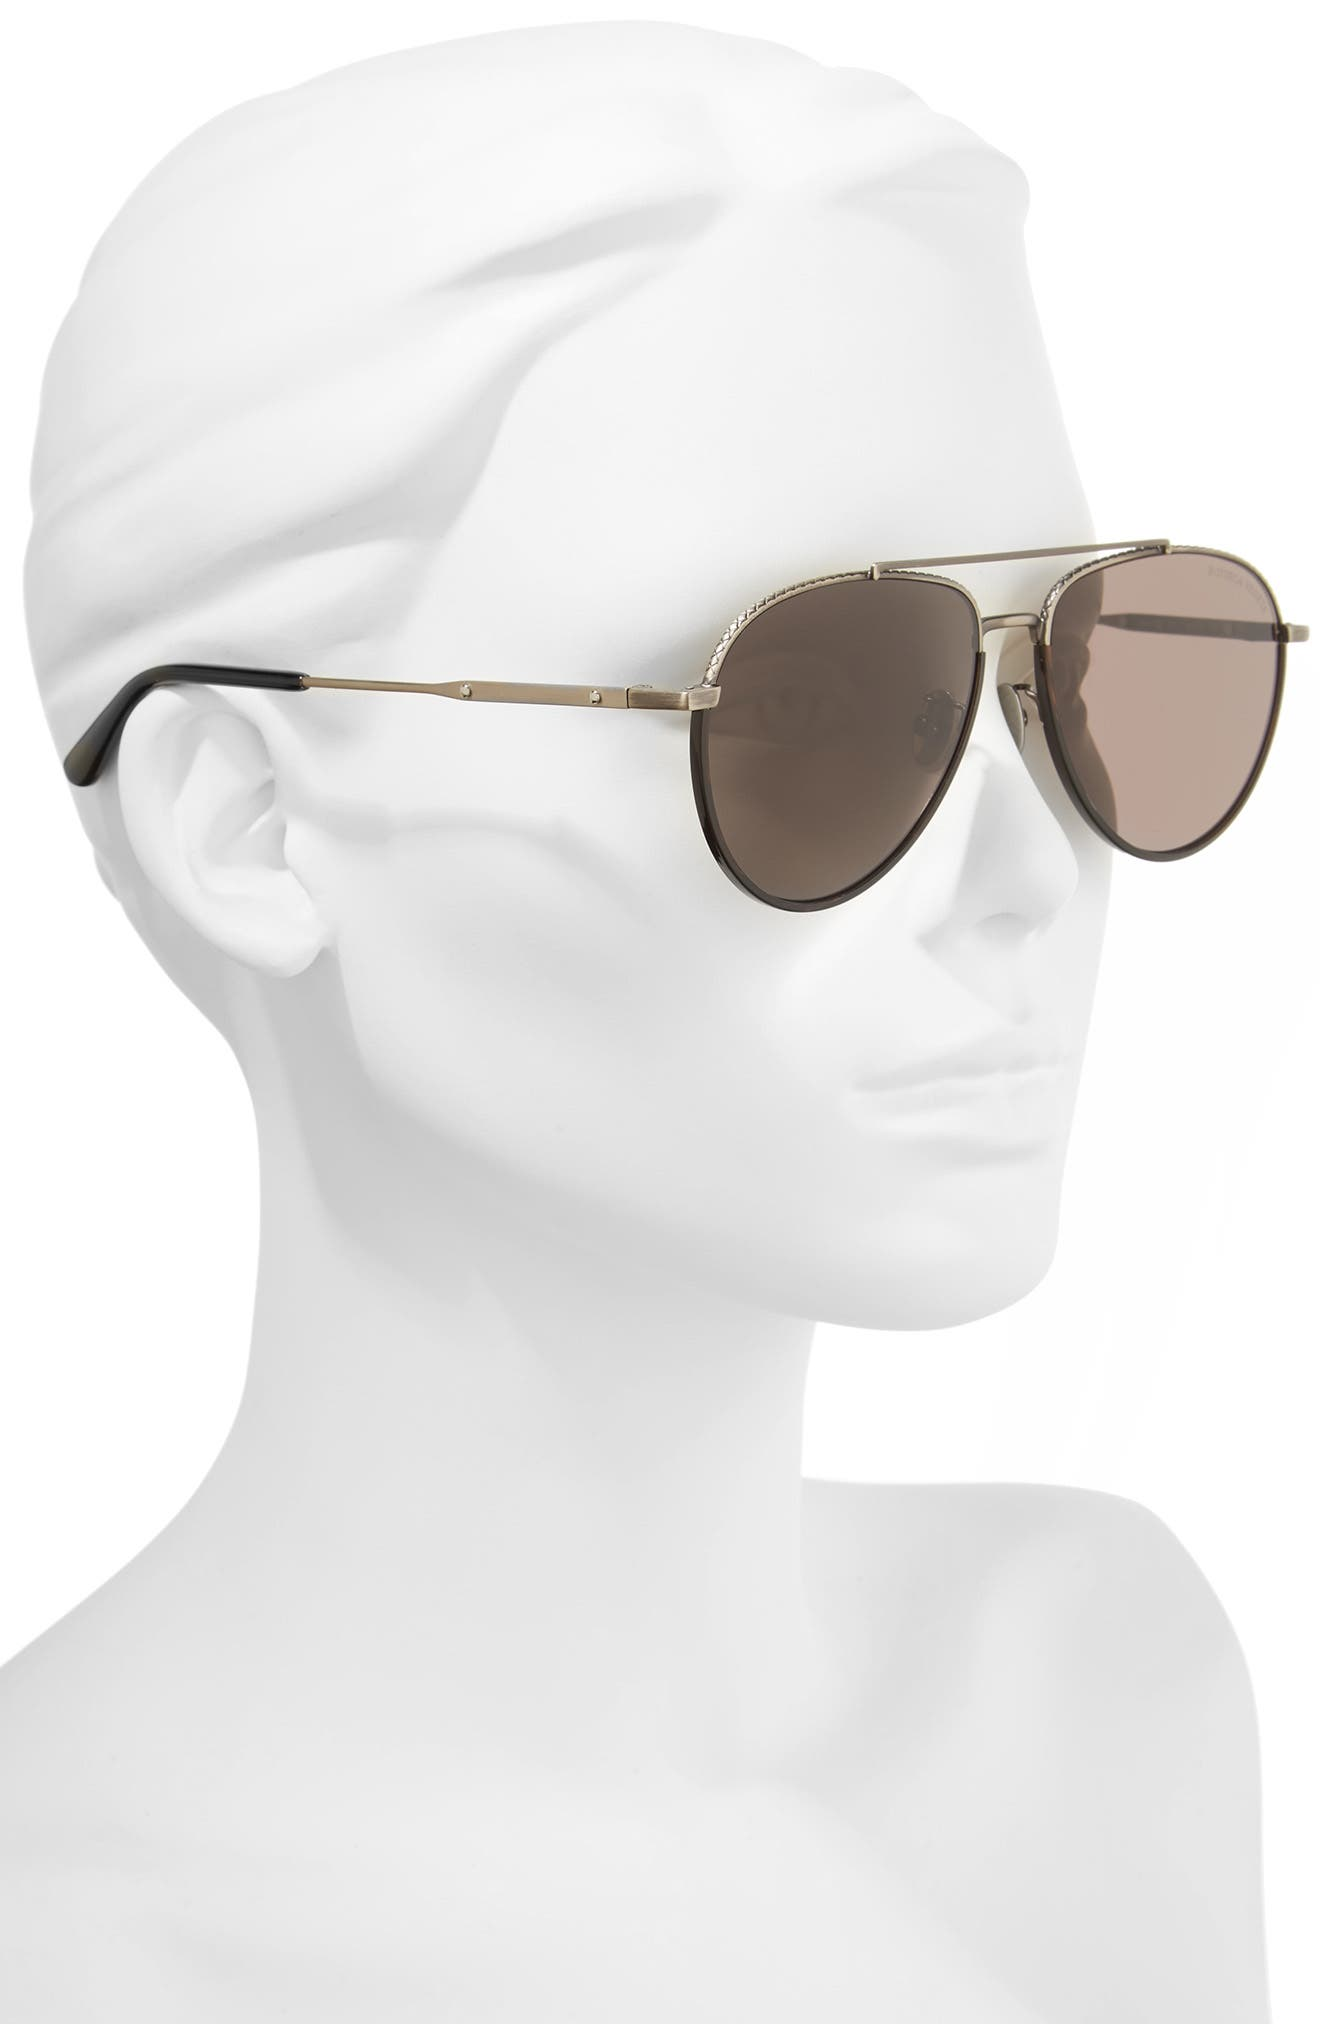 59mm Aviator Sunglasses,                             Alternate thumbnail 2, color,                             SILVER/ BLACK